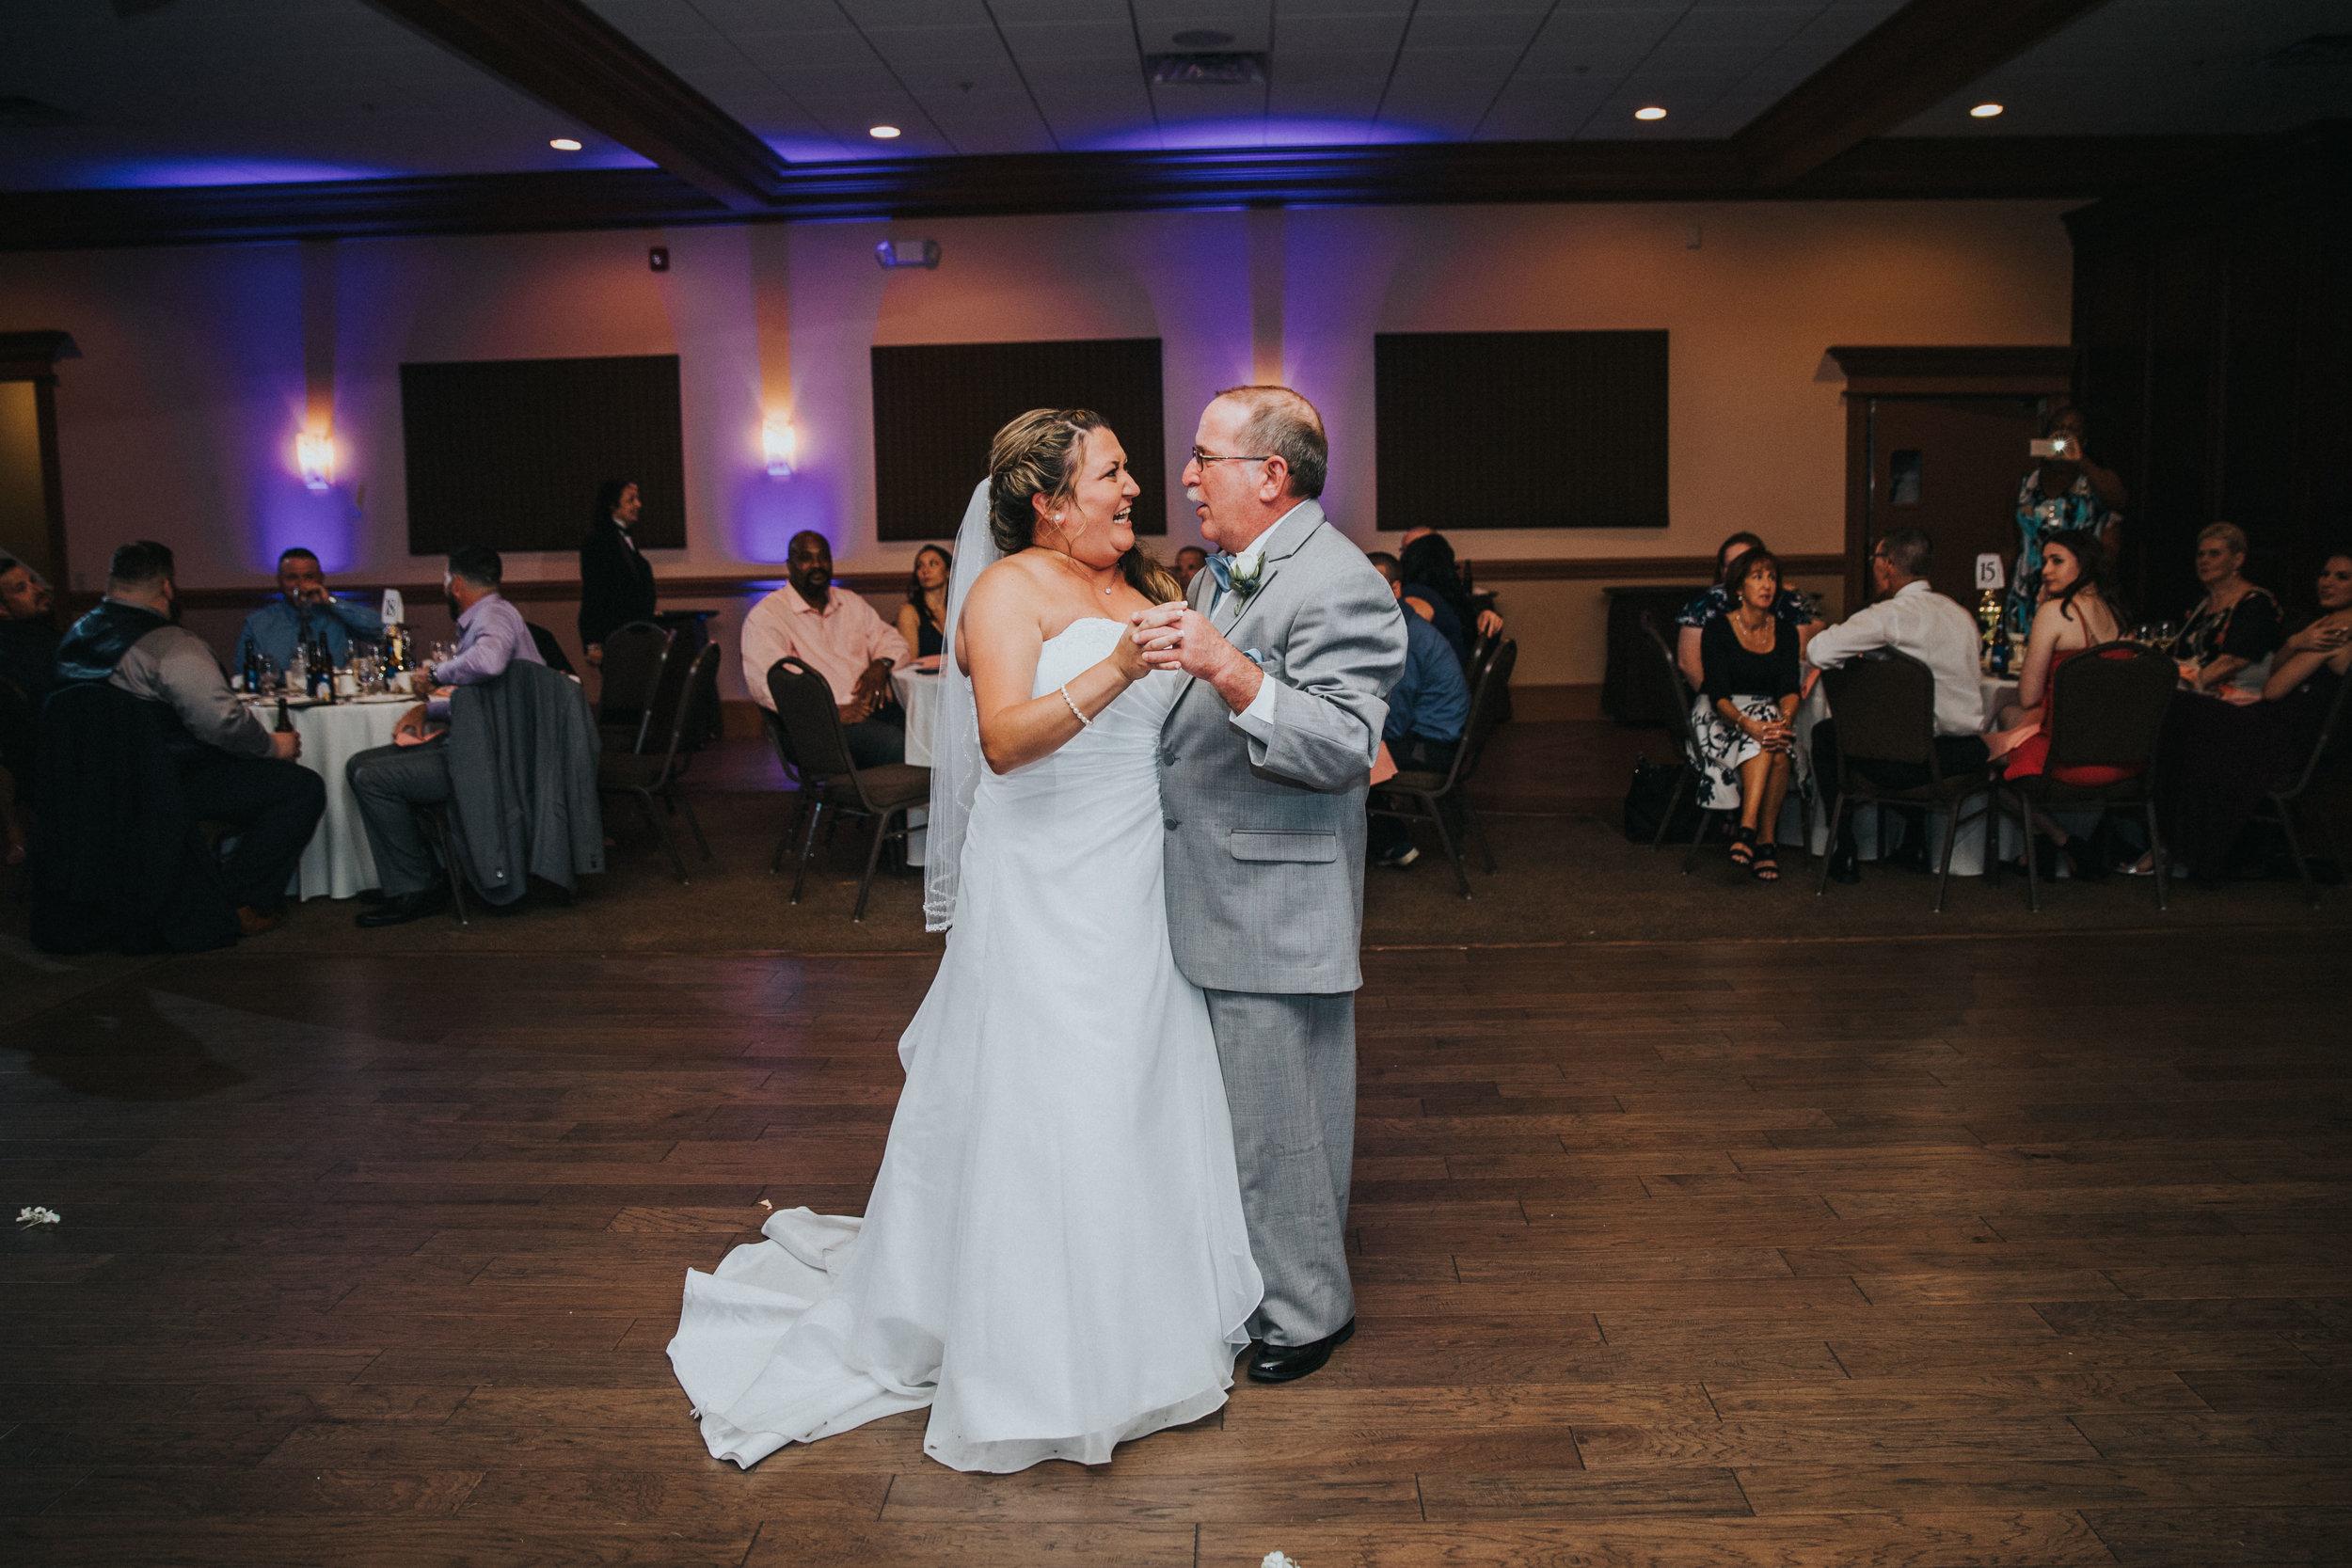 New-Jersey-Wedding-Photographer-JennaLynnPhotography-ValenzanoWinery-Reception-62.jpg